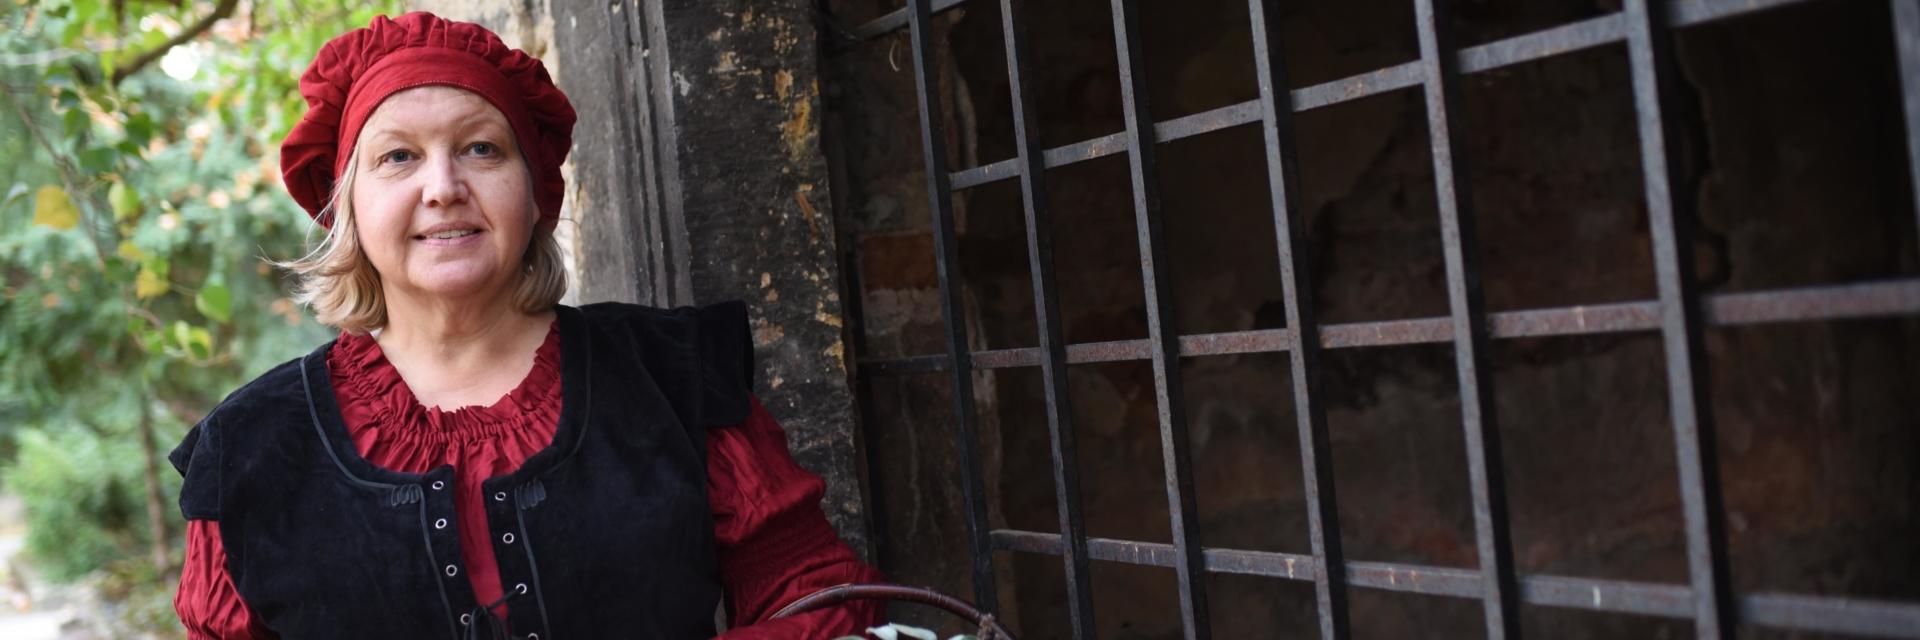 Stadtführung, Stadtrundgang, Jena, Rahmenprogramm, Incentive, Begleitprogramm, Konferenz, Tagung, Teufel, Nonnen, Ablasshandel. Reformation in Jena, Thüringen